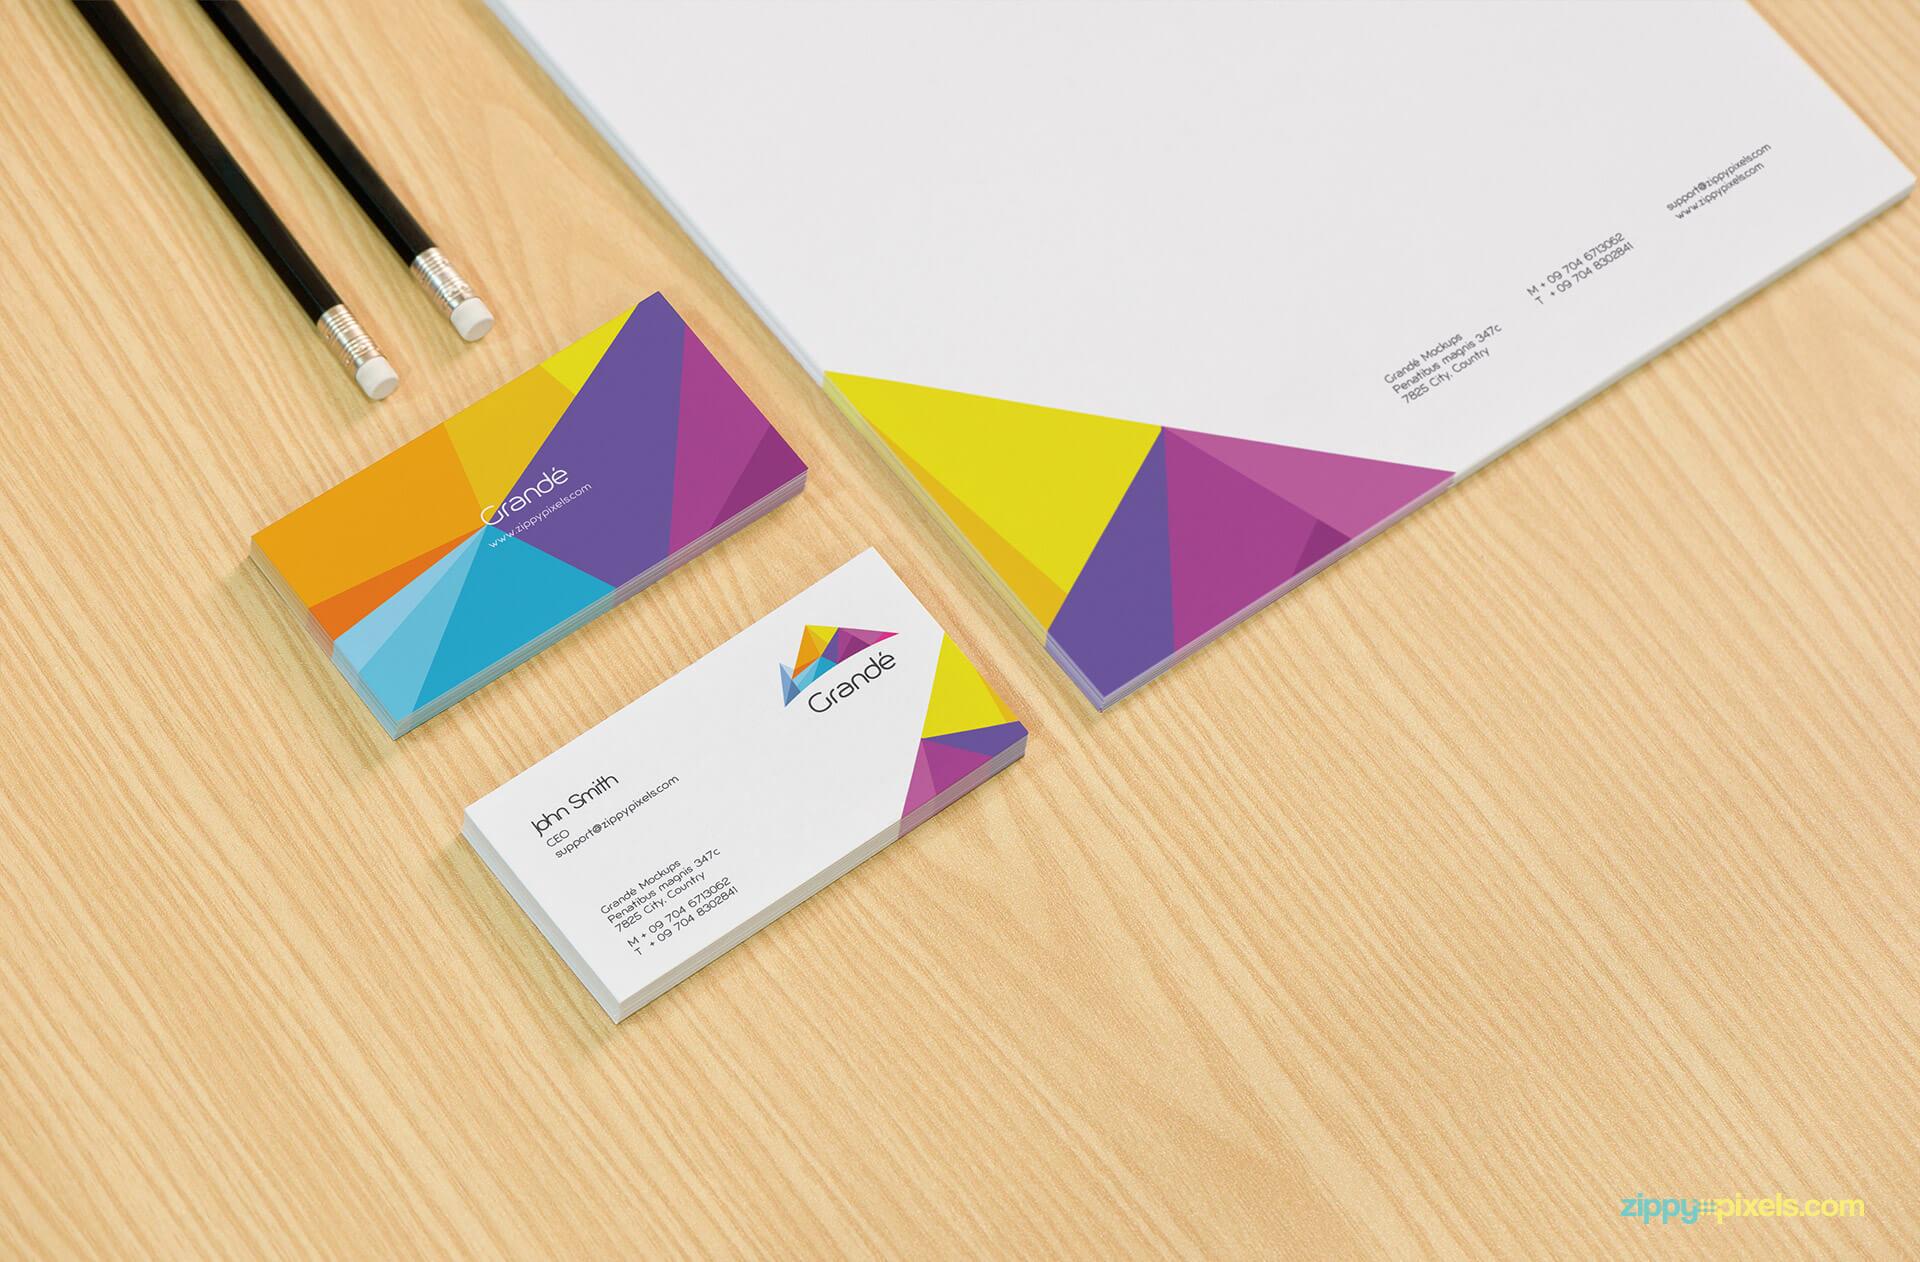 Stationery Branding Mockup of Business Cards & Letterhead